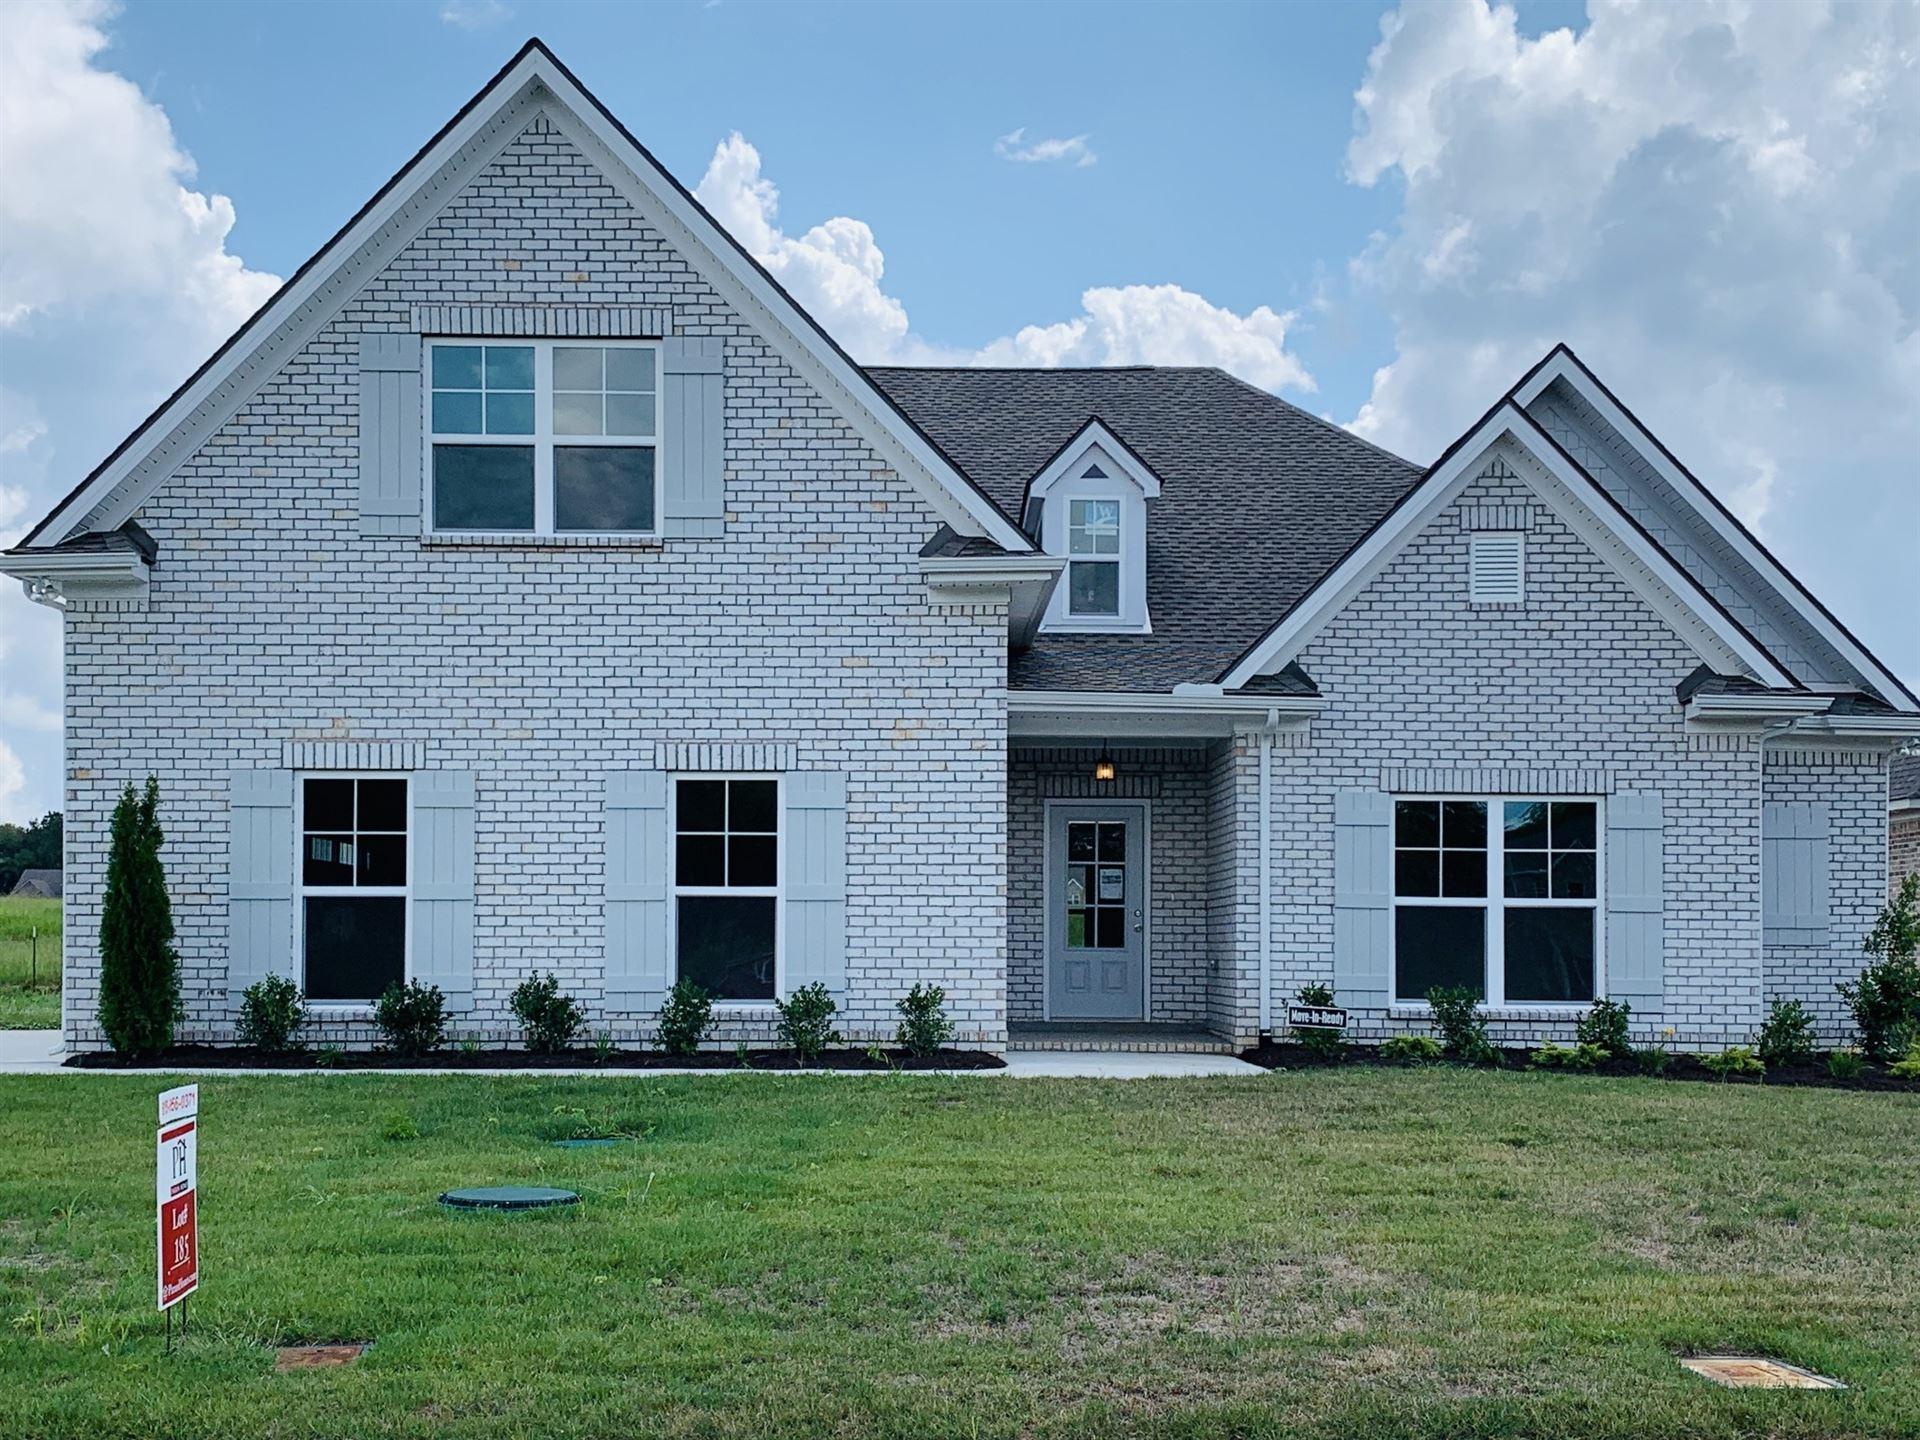 1209 Batbriar Rd, Murfreesboro, TN 37128 - MLS#: 2219141